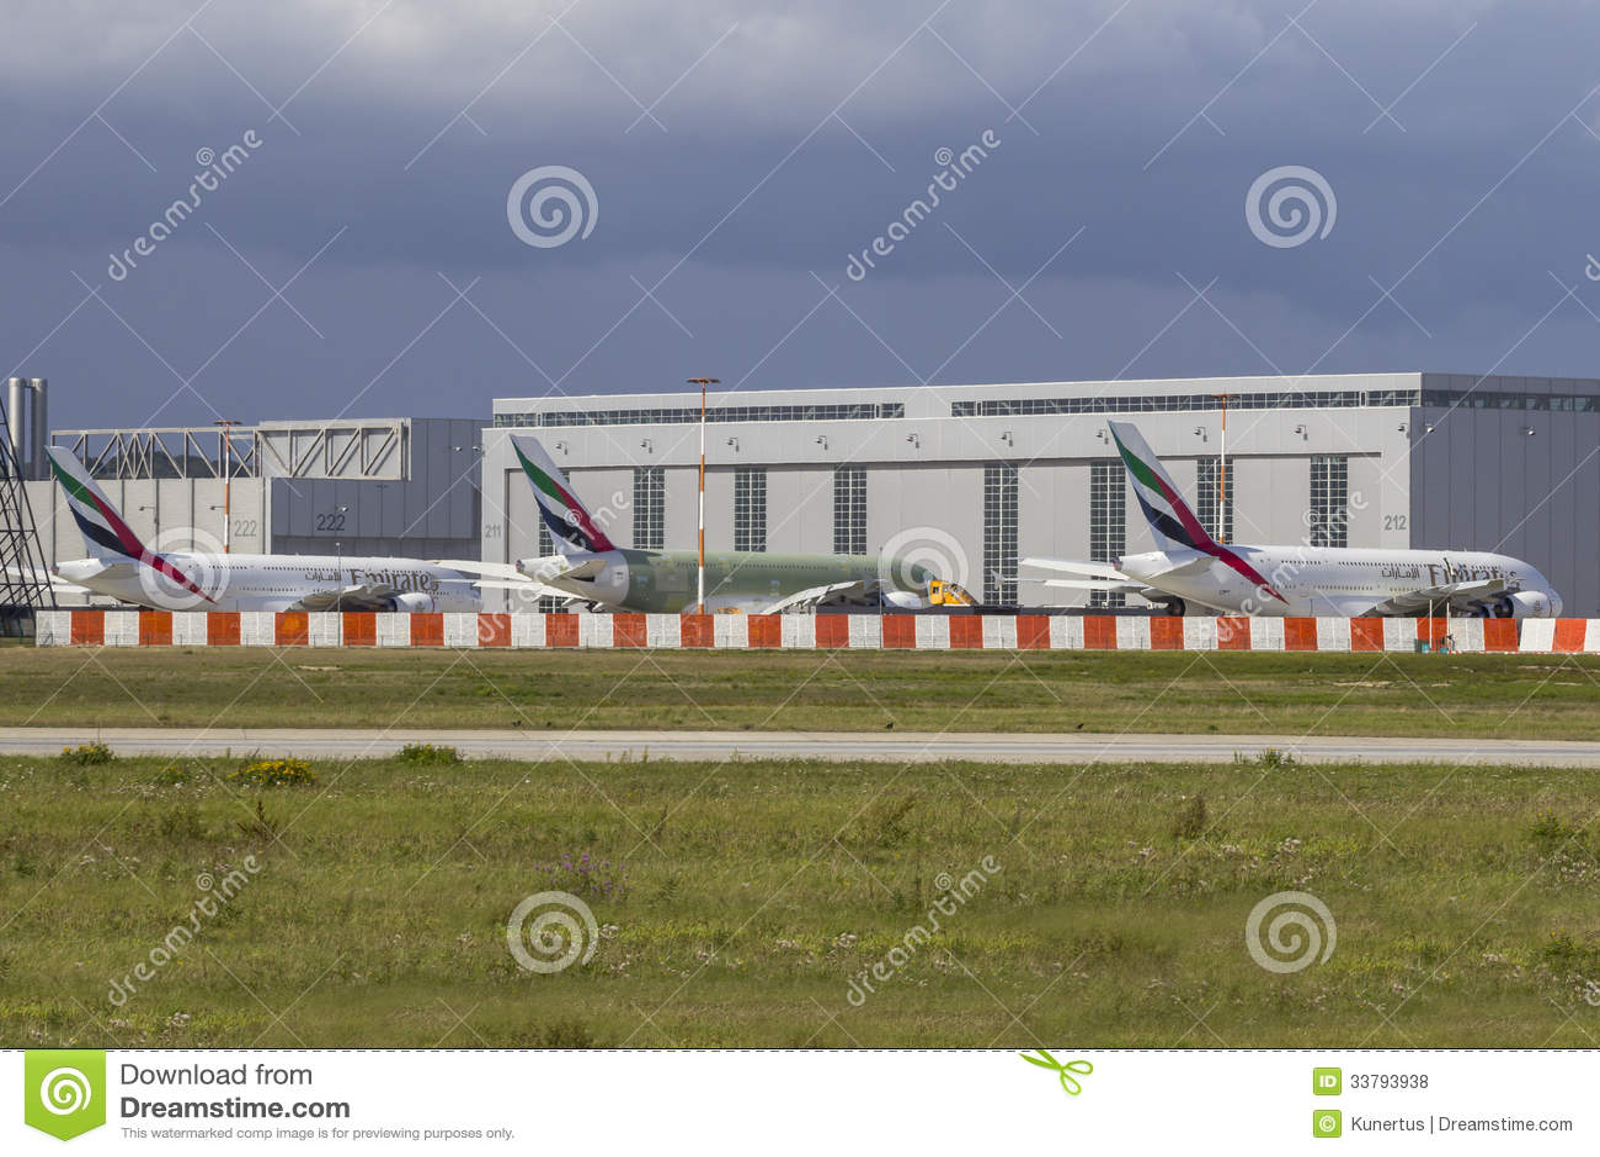 three emirates airbus a380 editorial stock photo image. Black Bedroom Furniture Sets. Home Design Ideas